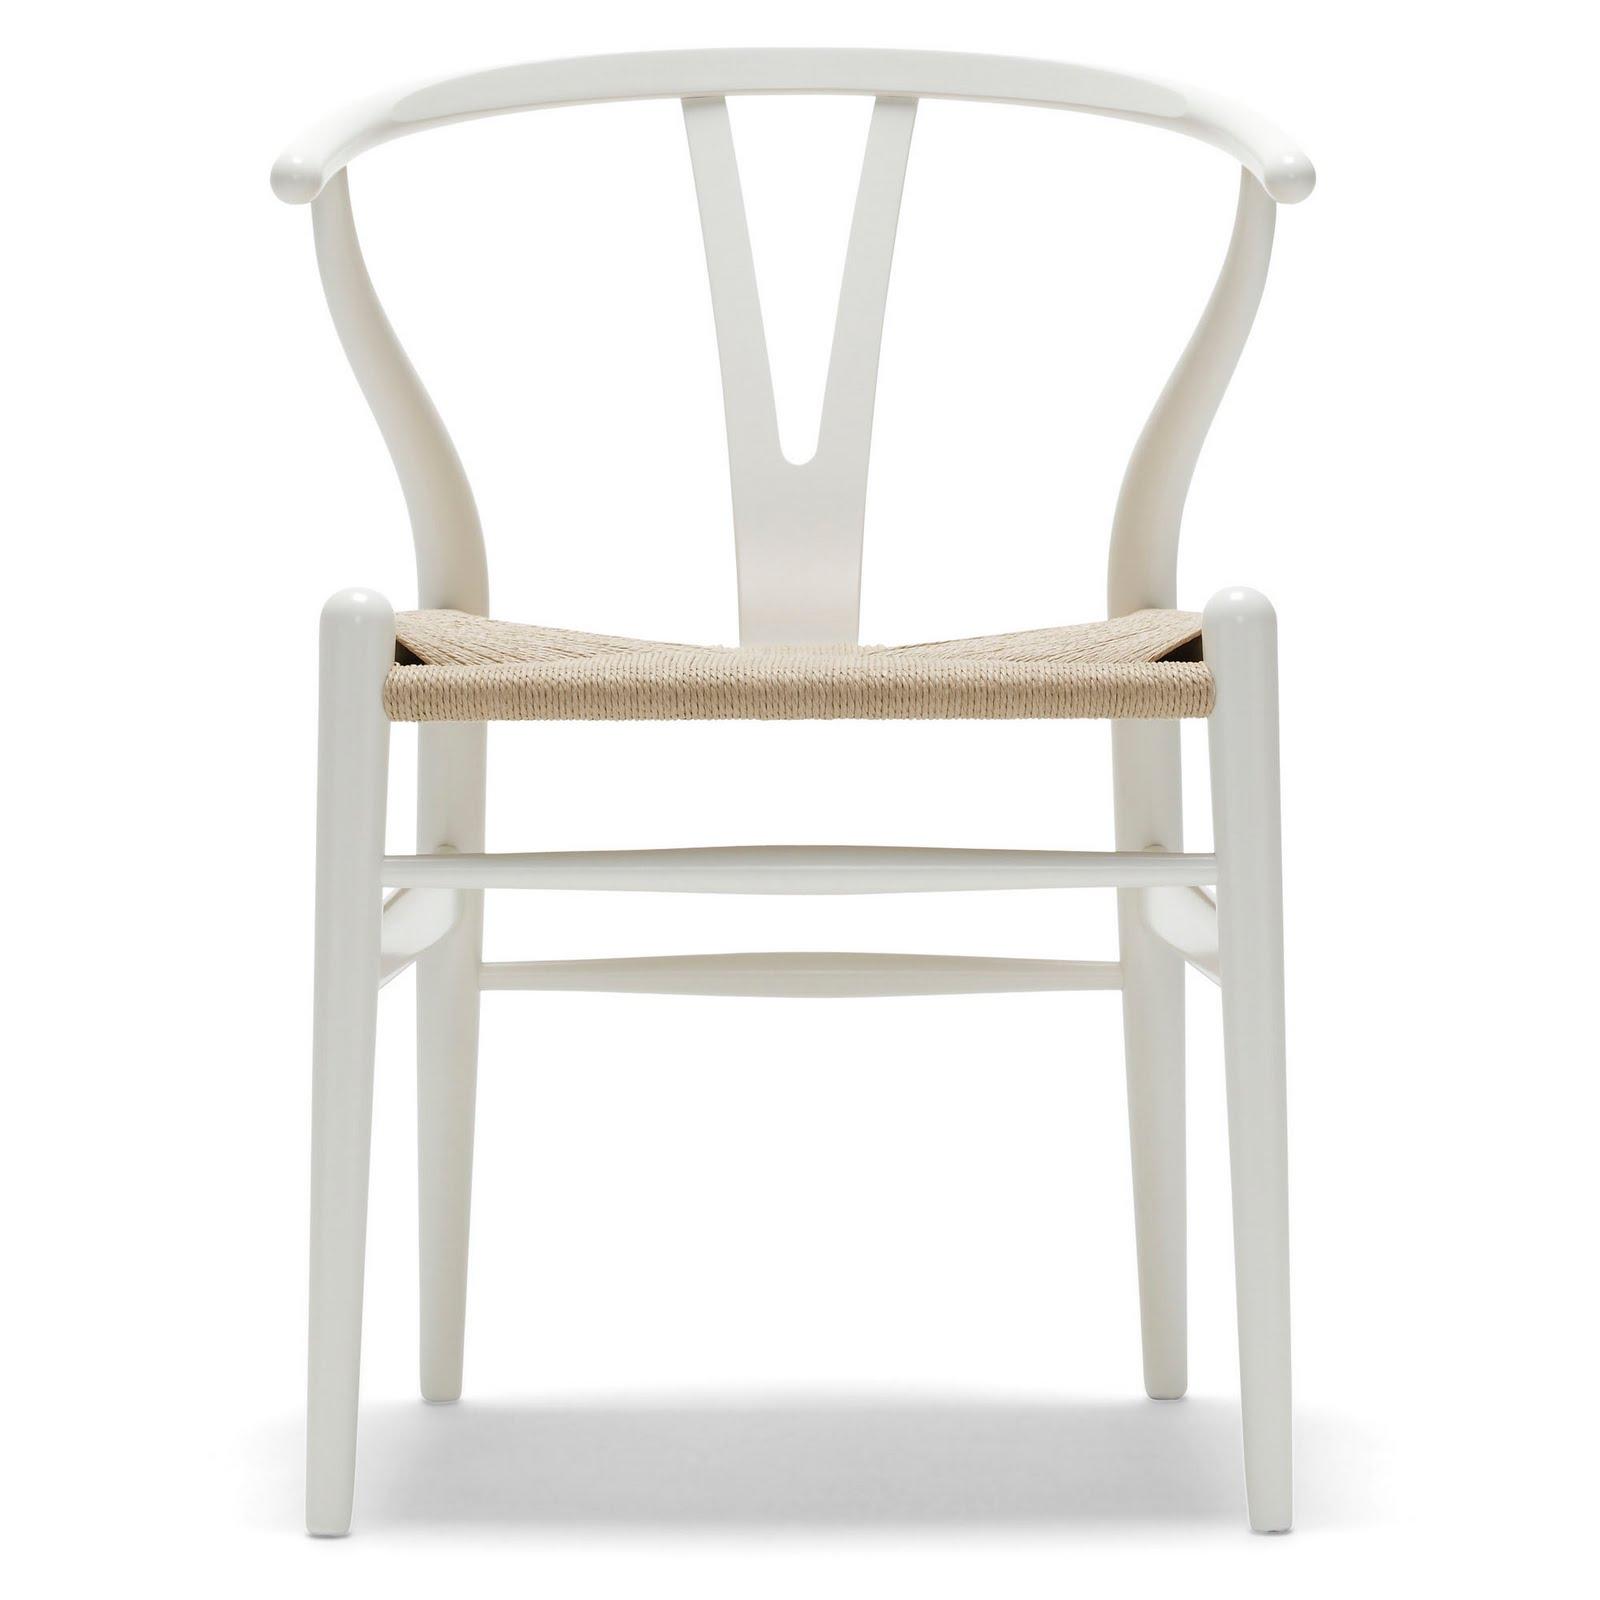 Forum tavolo design nordico quali sedie for Sedie design nordico